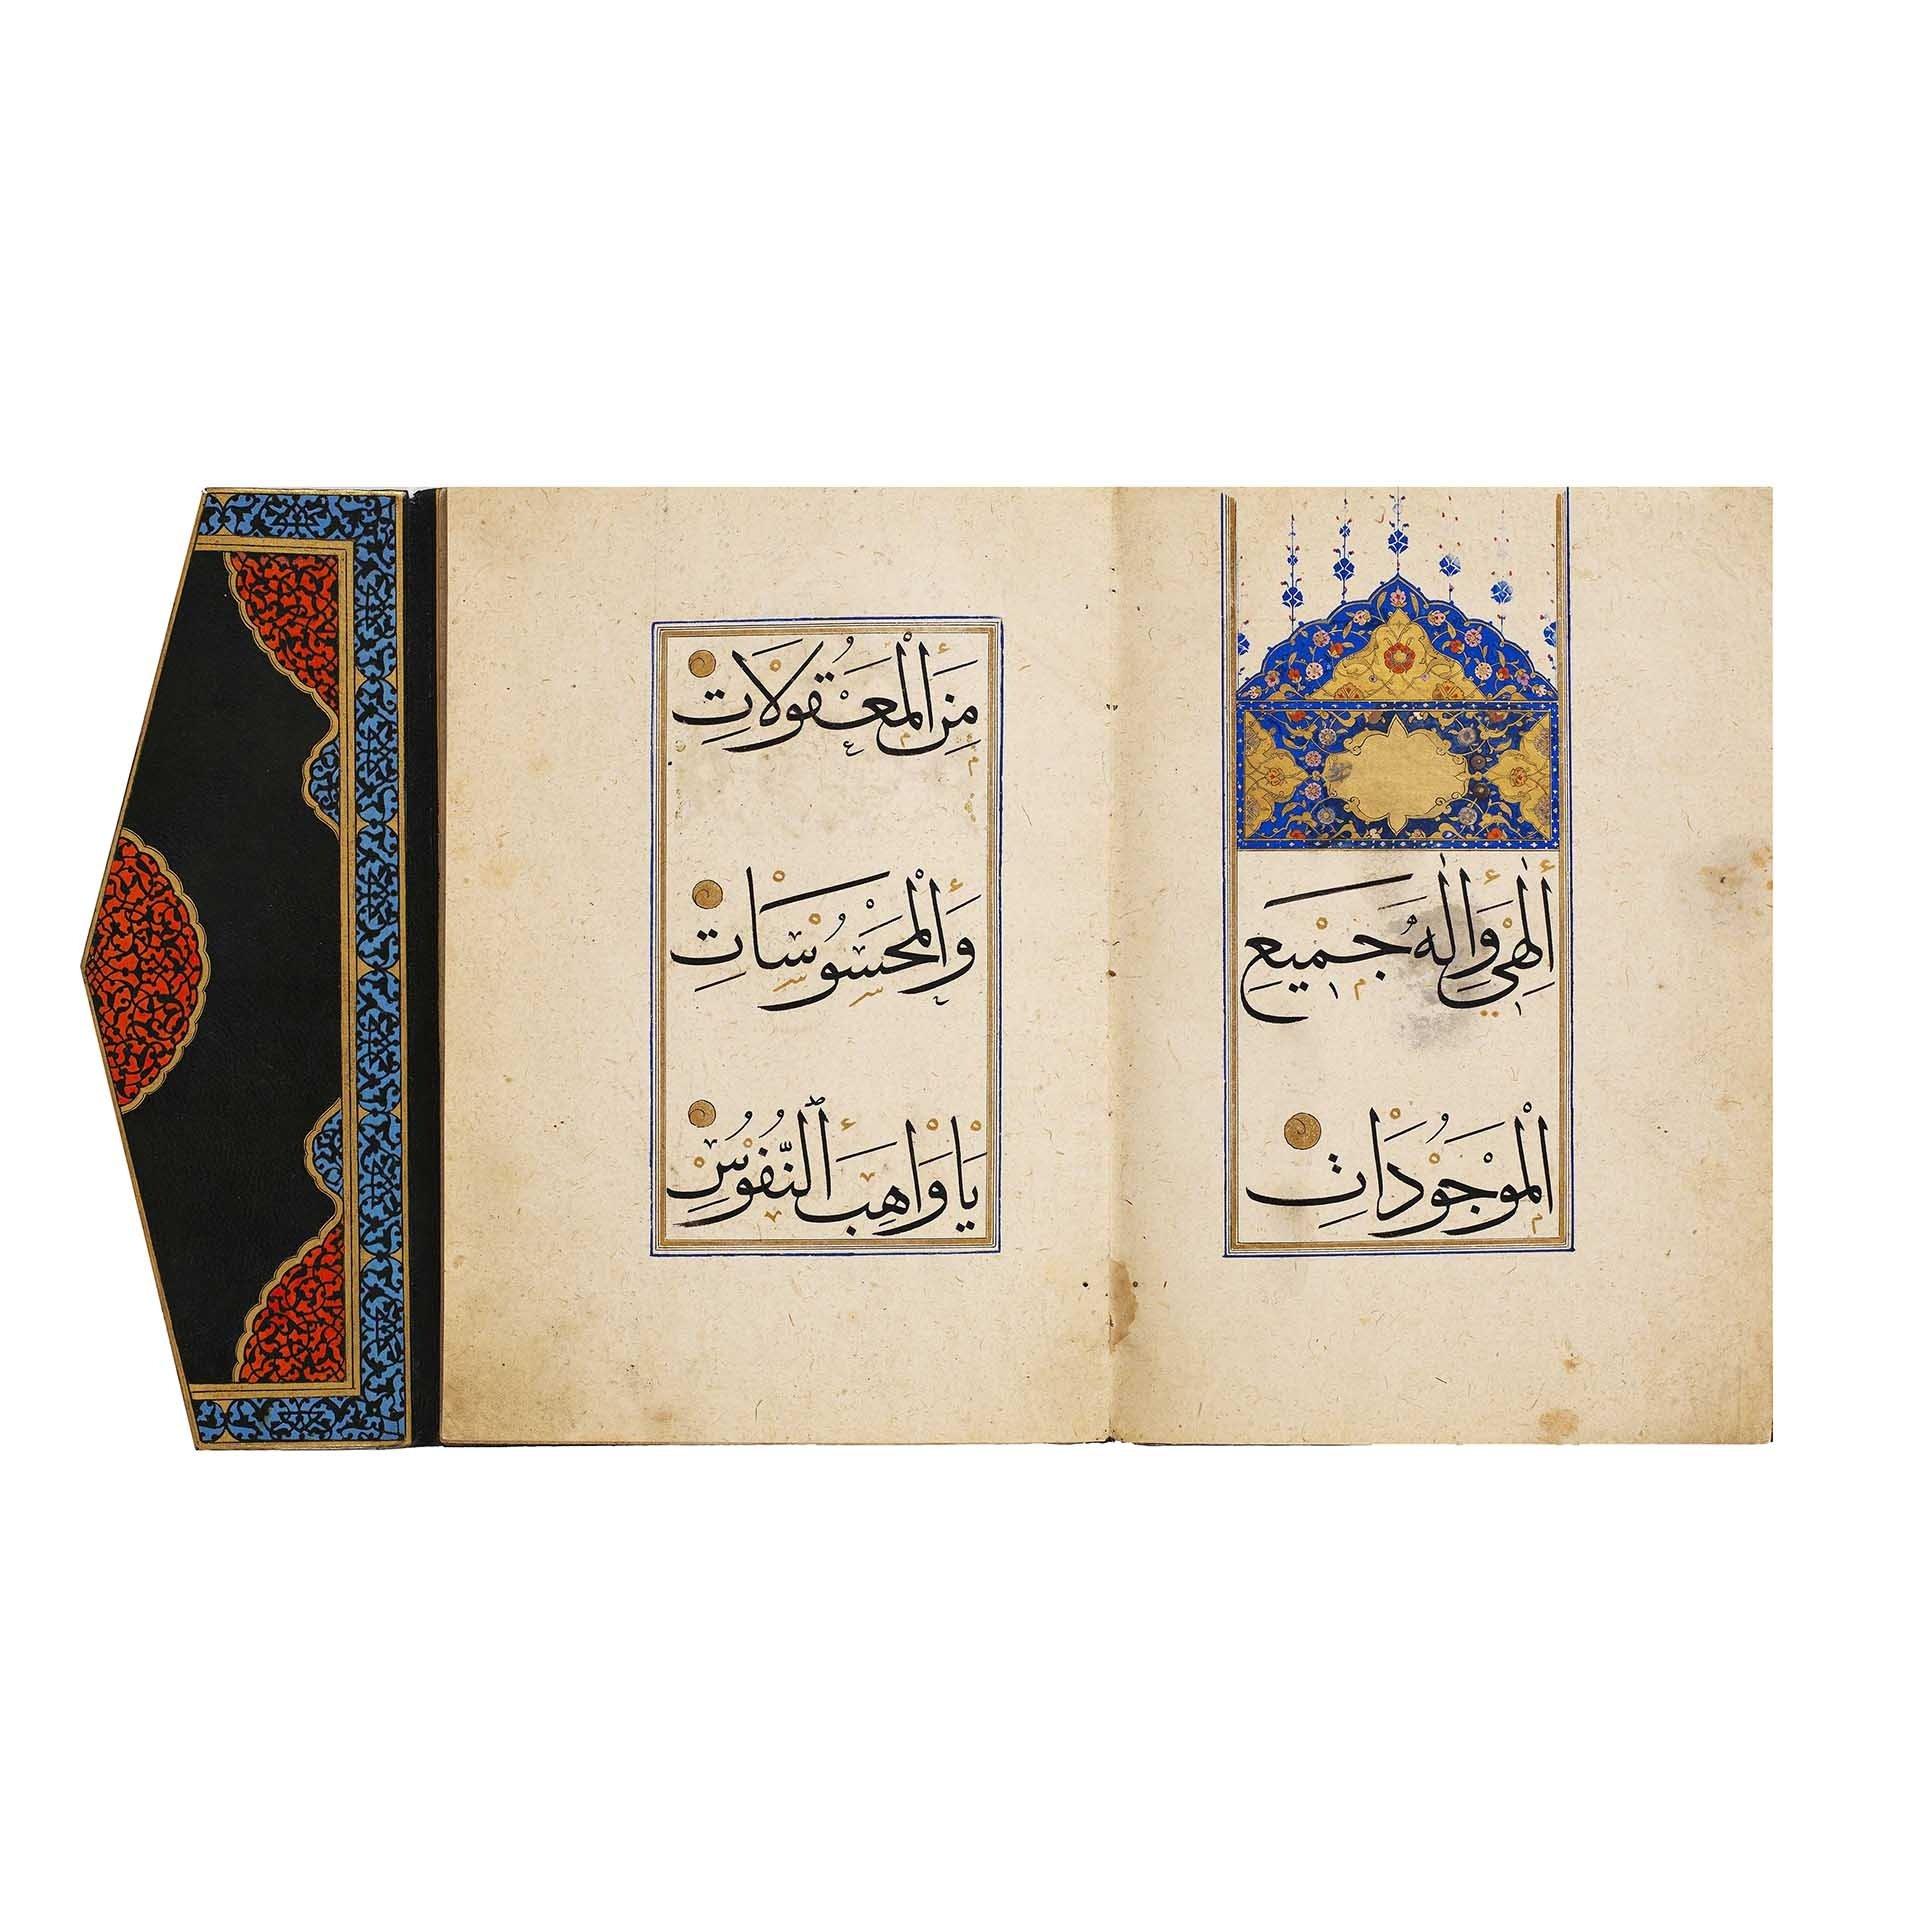 An anthology of prayers featuring muhaqqaq and reqa scripts by Sheikh Hamdullah. (Courtesy of Sakıp Sabancı Museum)